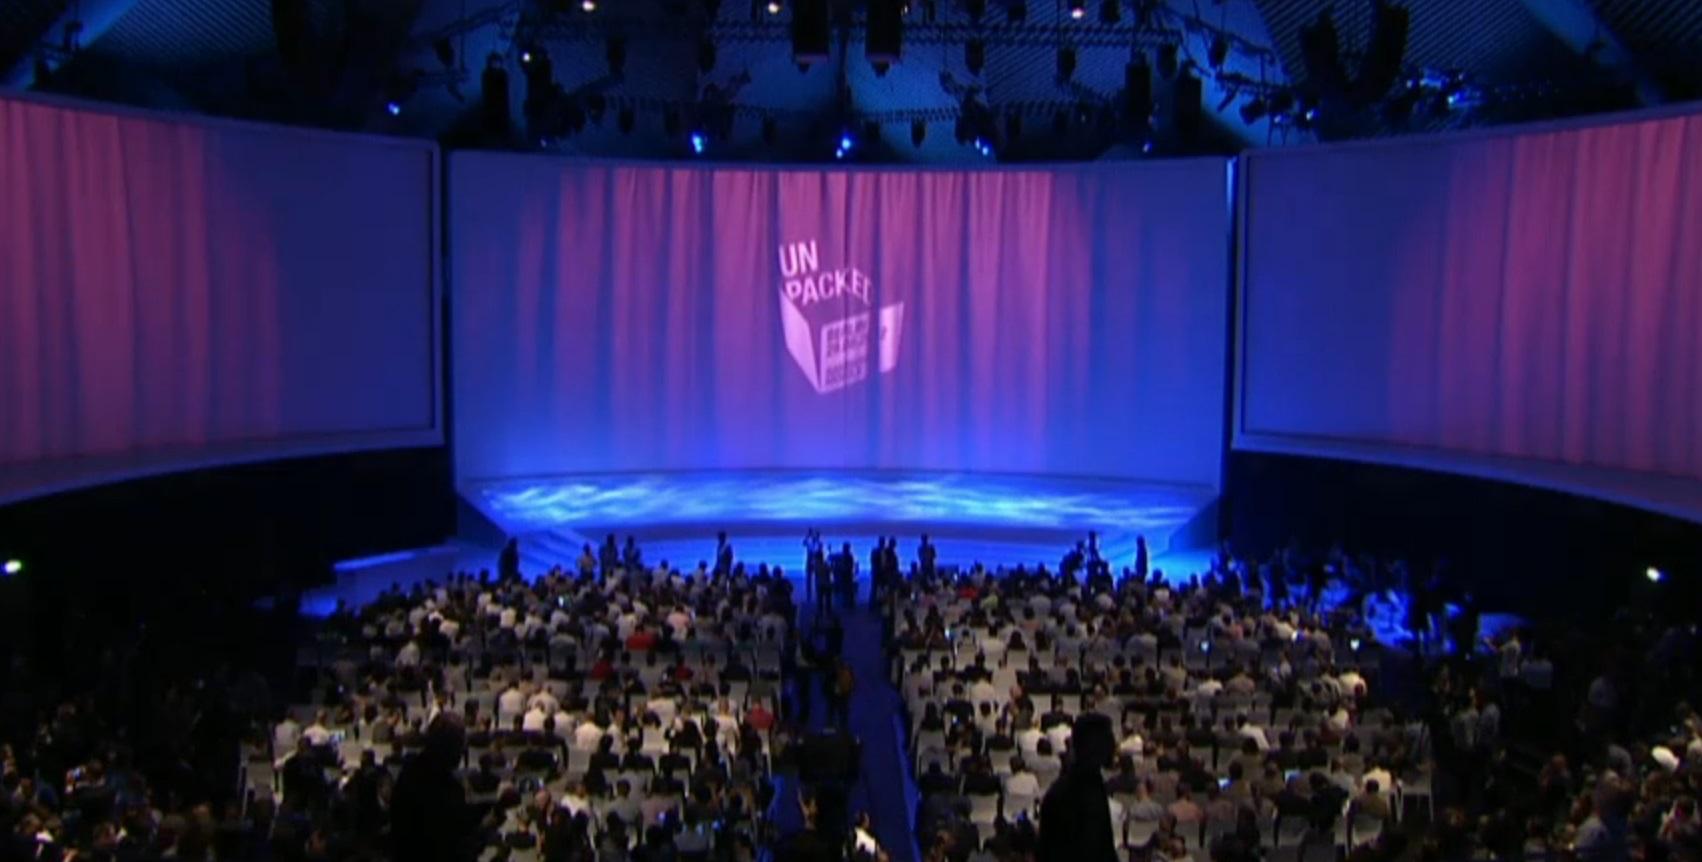 Samsung kondigt Galaxy Note II aan op IFA 2012: 5.5 inch scherm en Jelly Bean